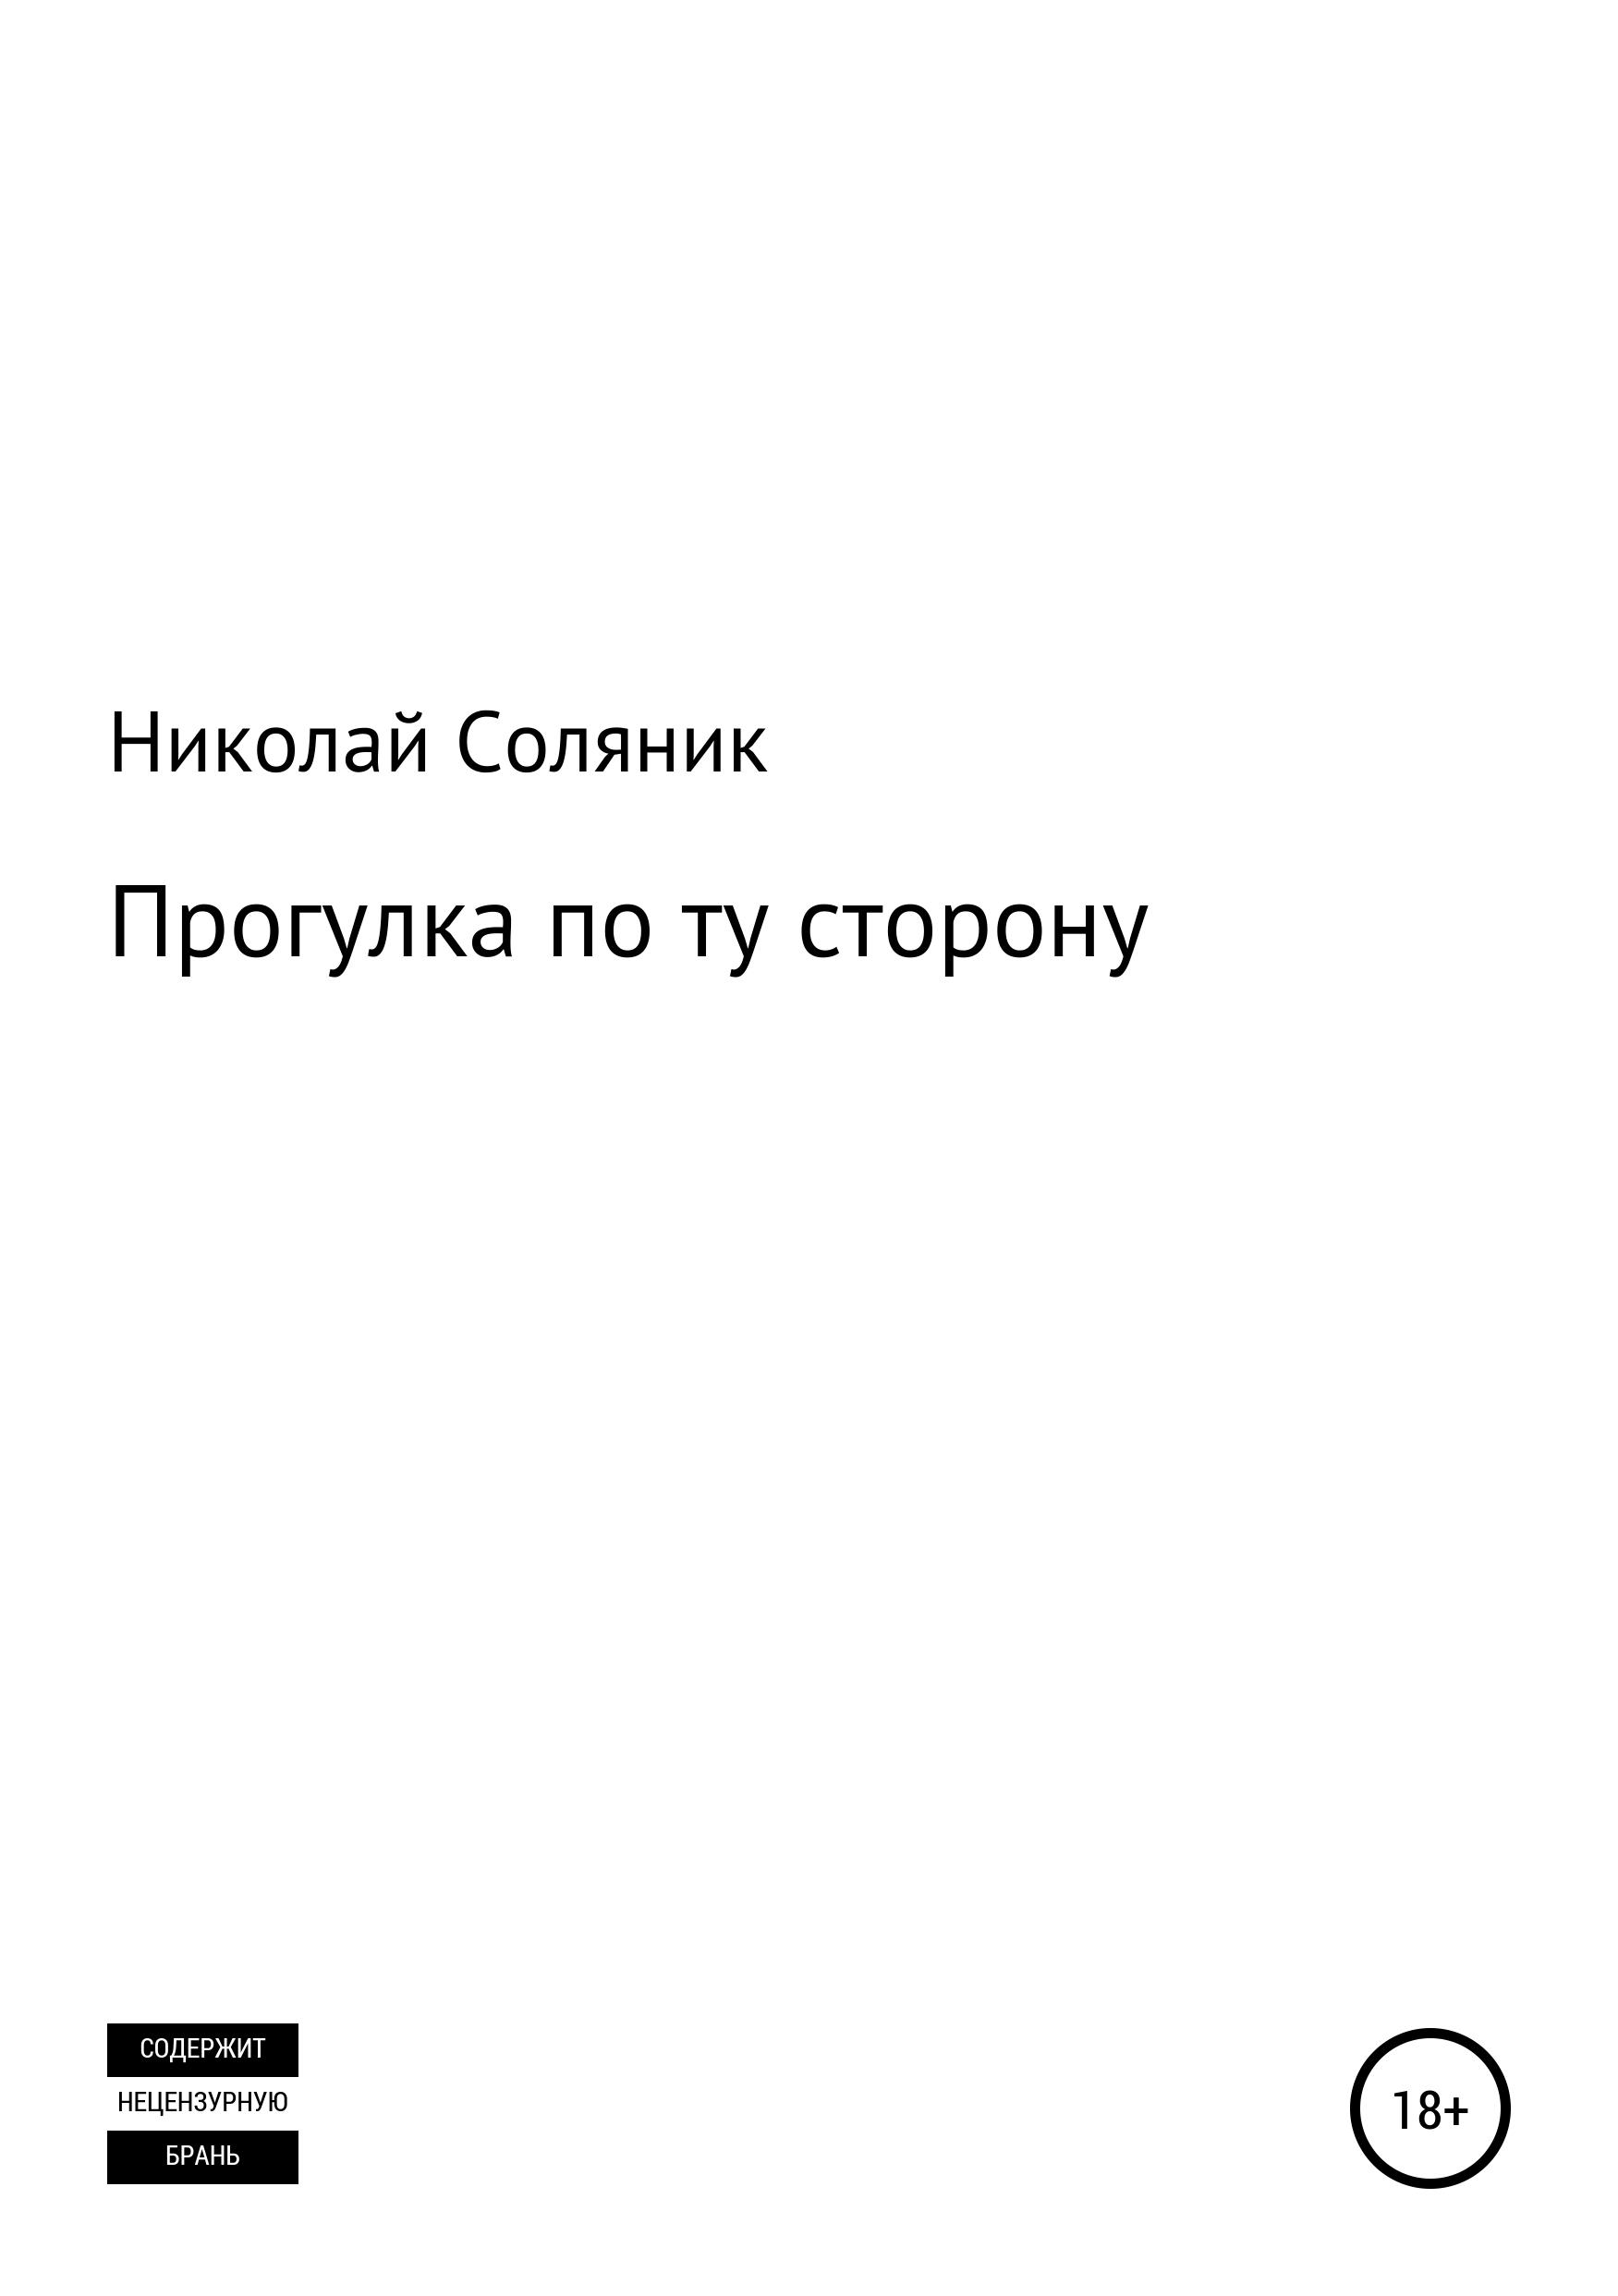 Николай Соляник Прогулка по ту сторону